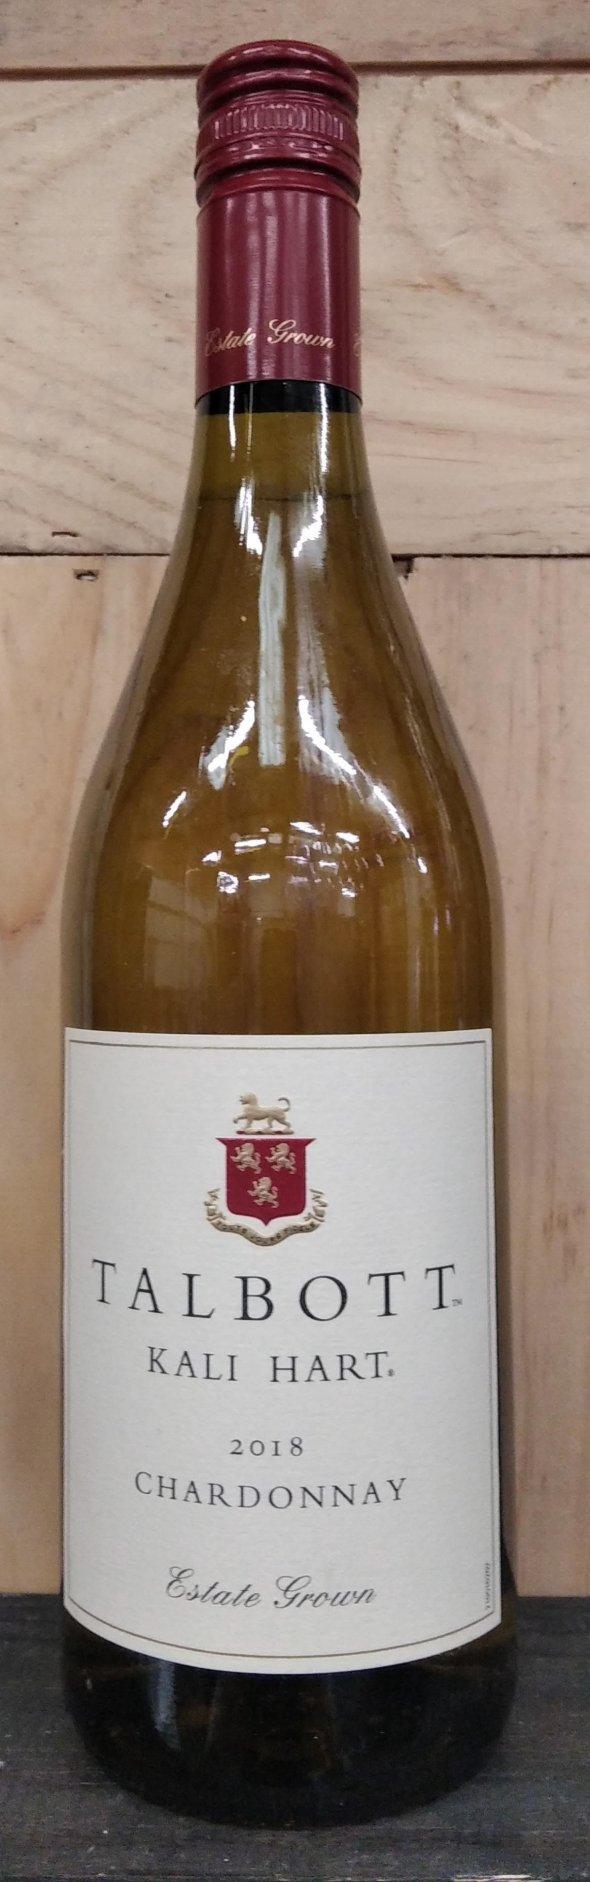 Talbott, Kali Hart Chardonnay, Monterey